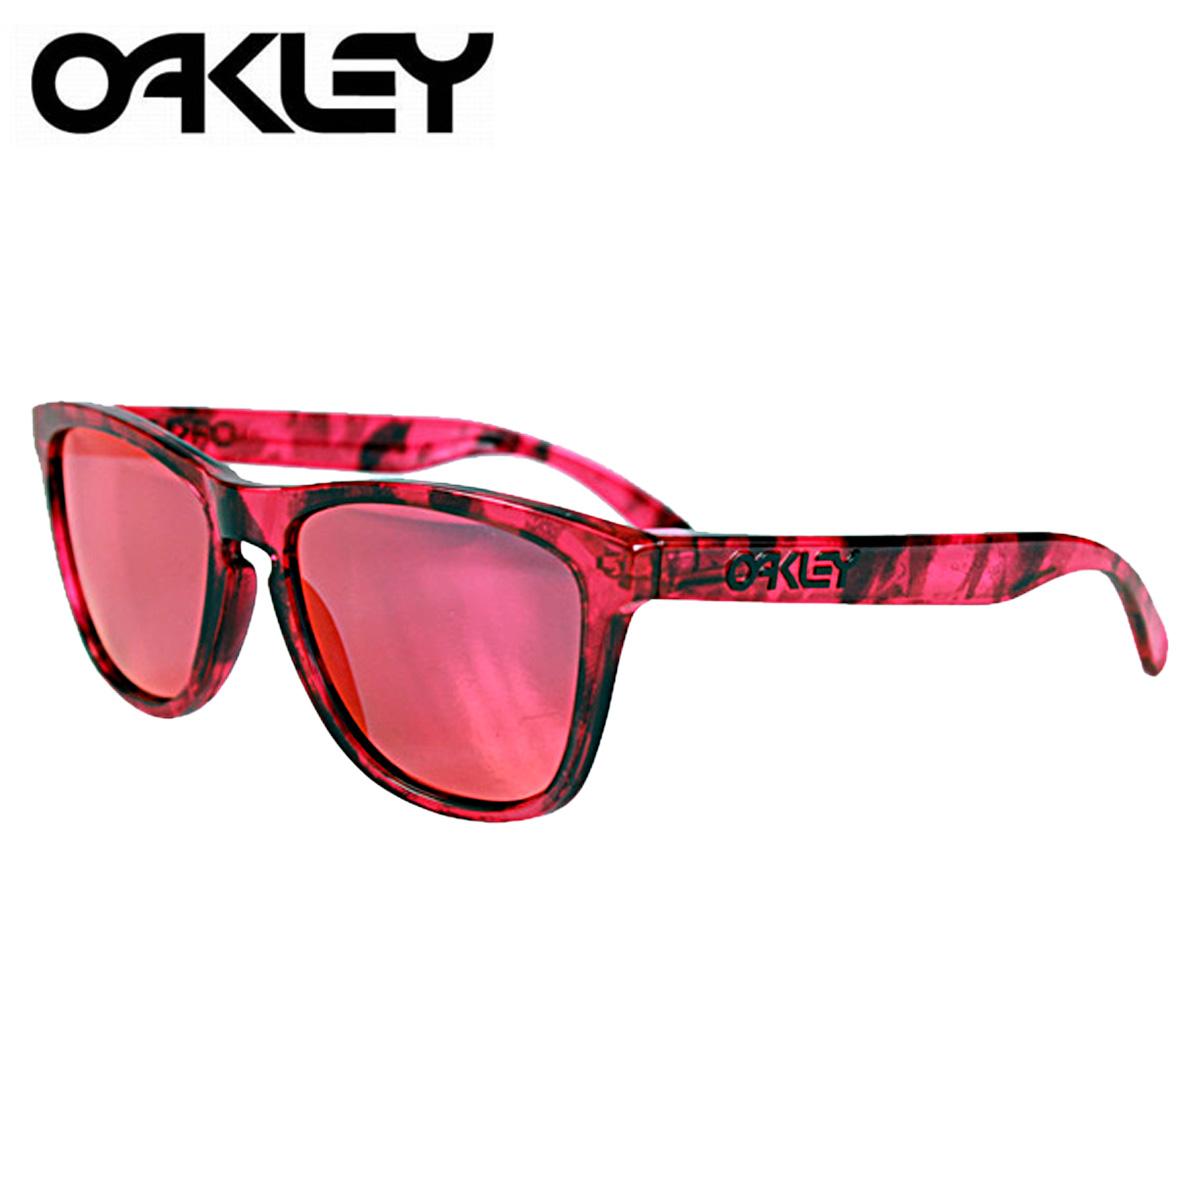 64690a17ef ... new arrivals allsports rakuten global market sold out oakley oakley  sunglasses frogskins frog skin glasses 24 ...